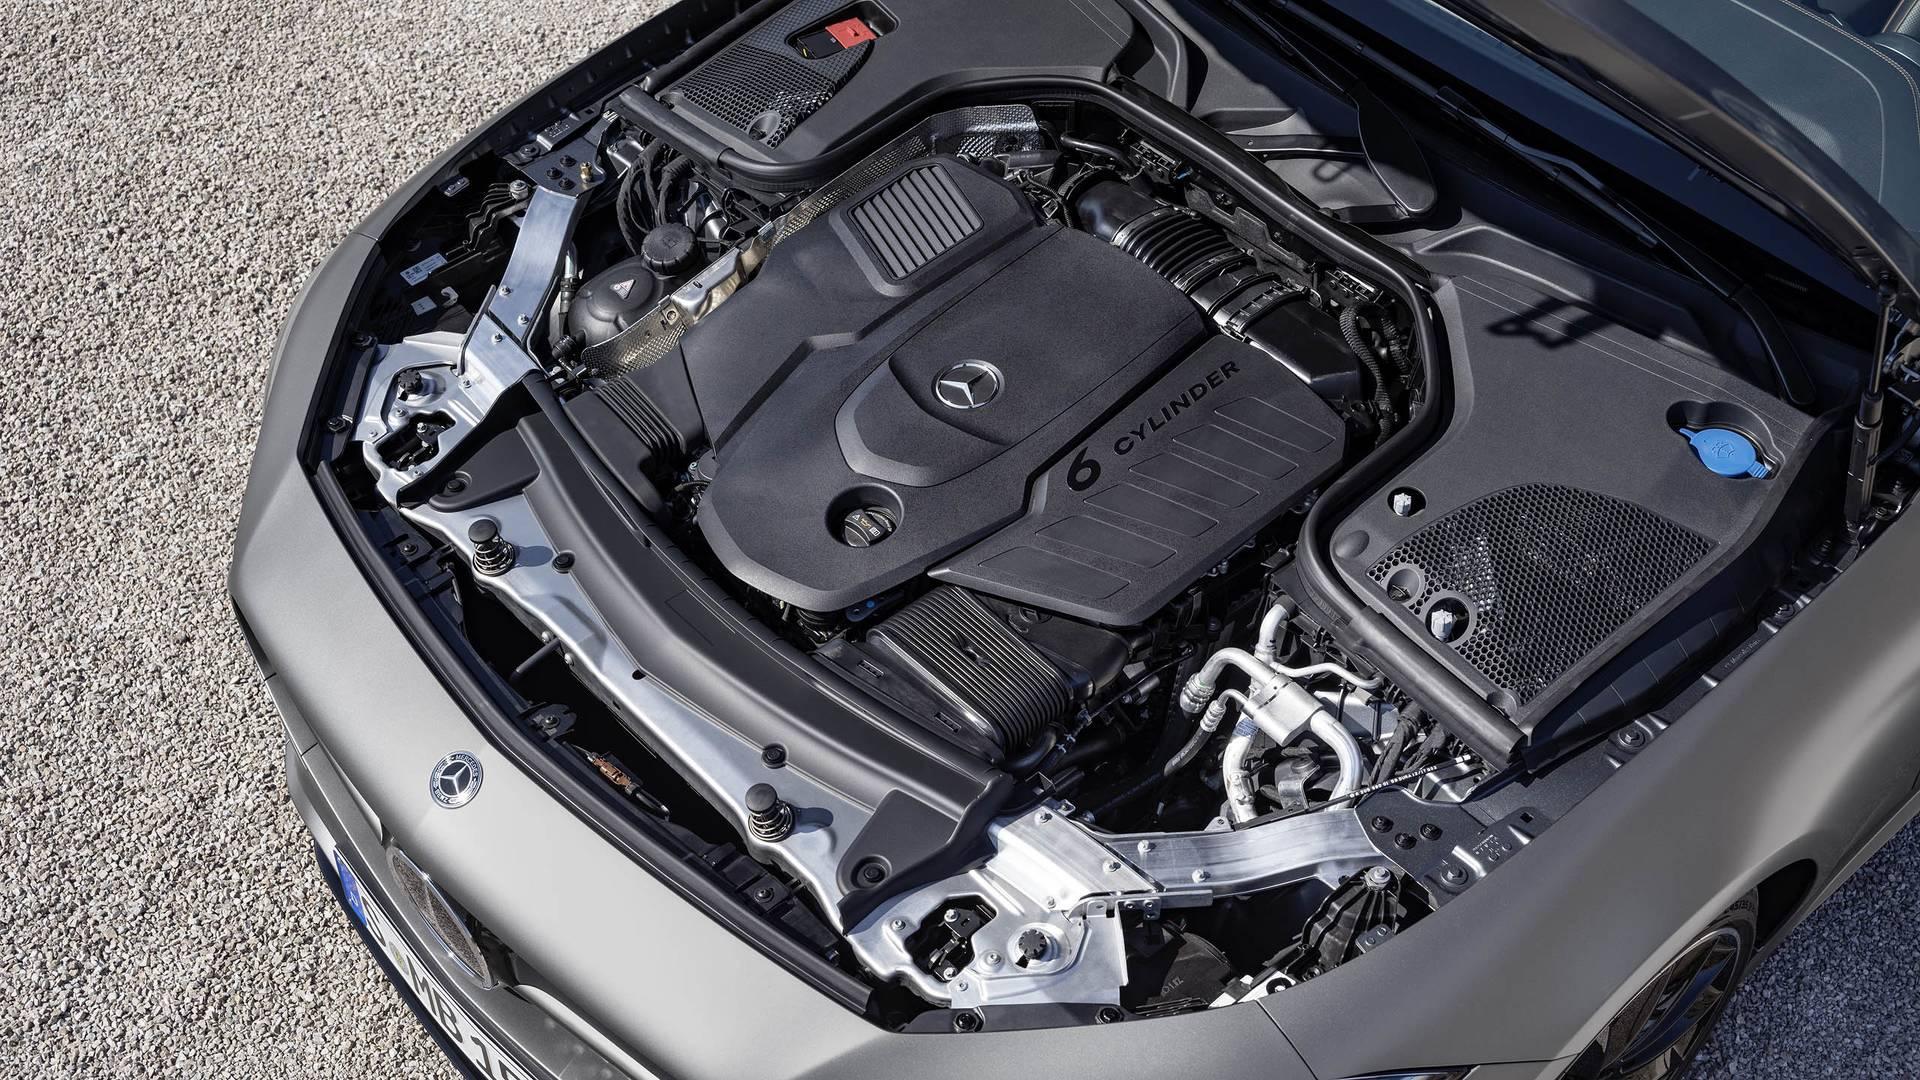 Photo of 452 otomobil motorunu satarken yakalandı!